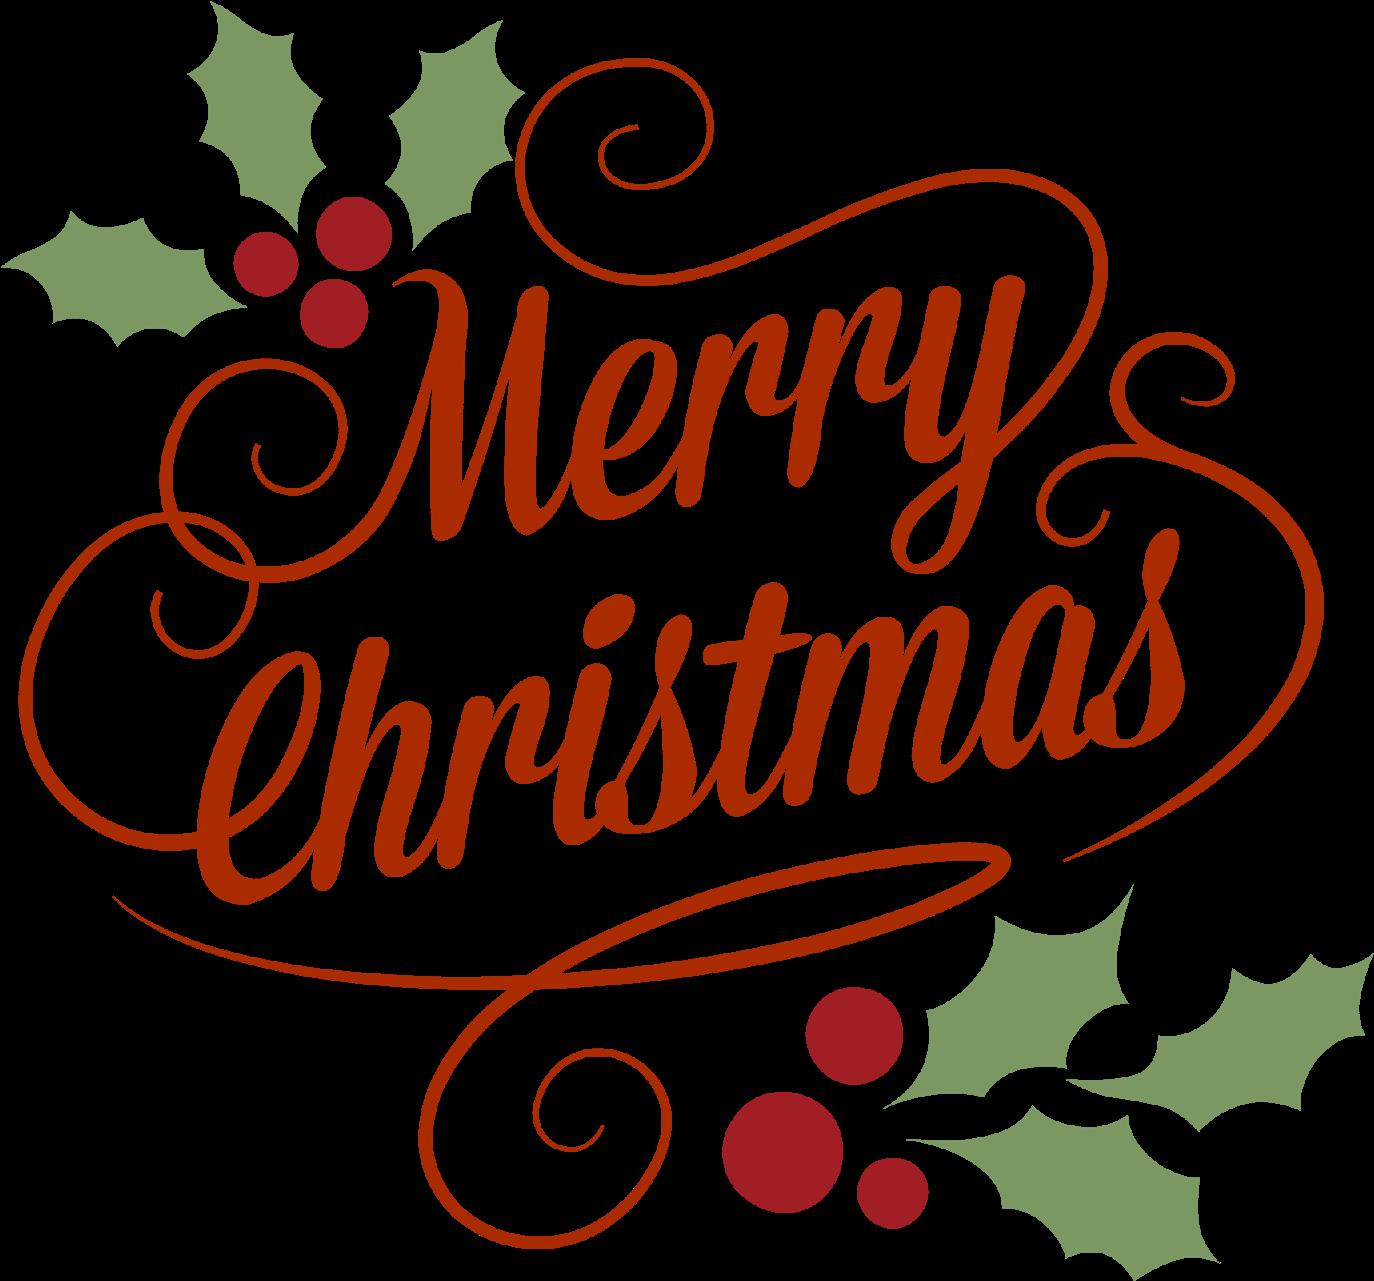 Merry Christmas Png - Habitat For Humanity Christmas (1600x1600)